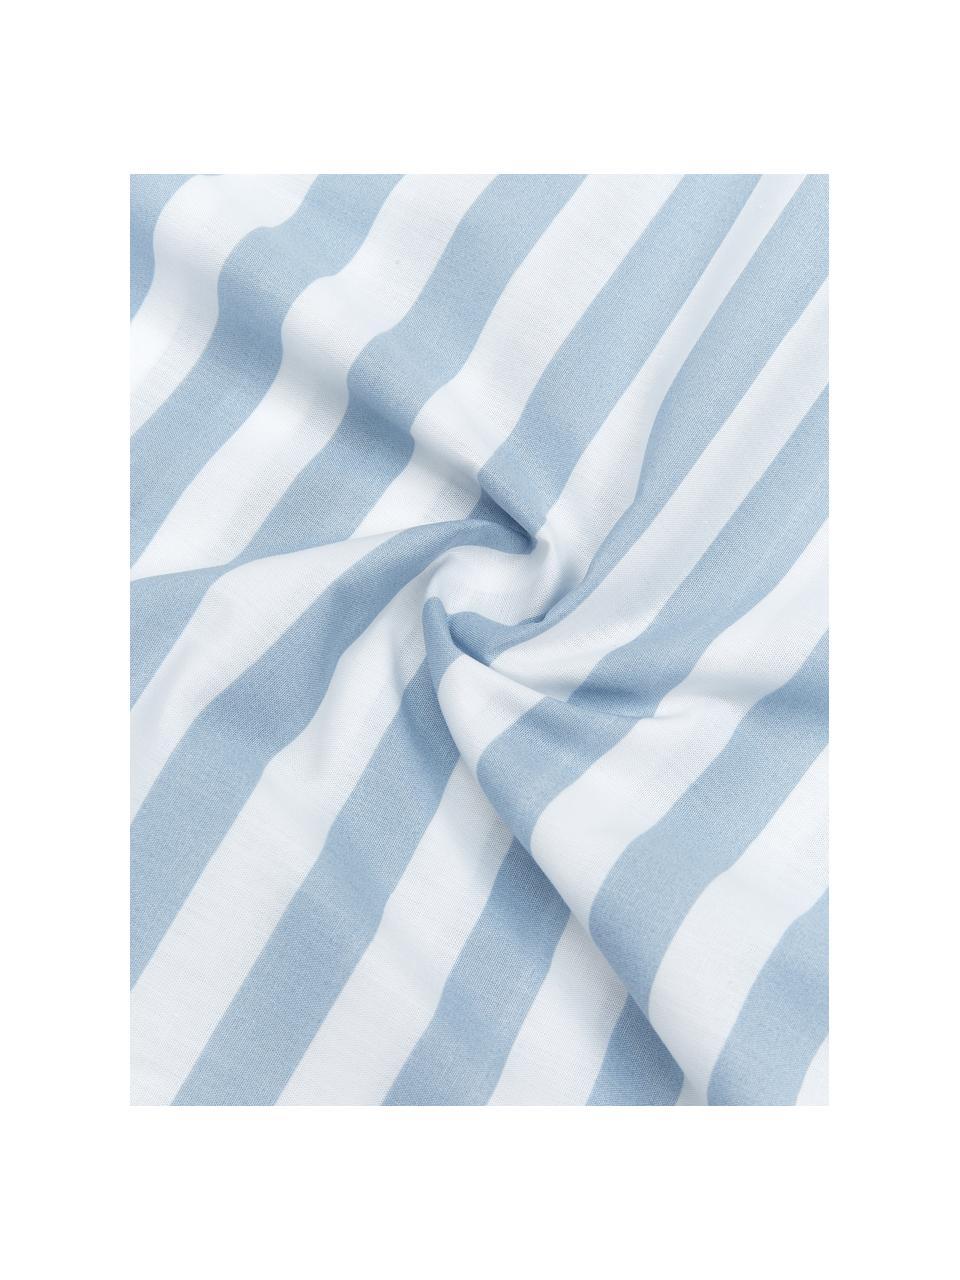 Gestreifte Baumwollperkal-Bettwäsche Yuliya, Webart: Perkal Fadendichte 180 TC, Blau, Weiß, 240 x 220 cm + 2 Kissen 80 x 80 cm